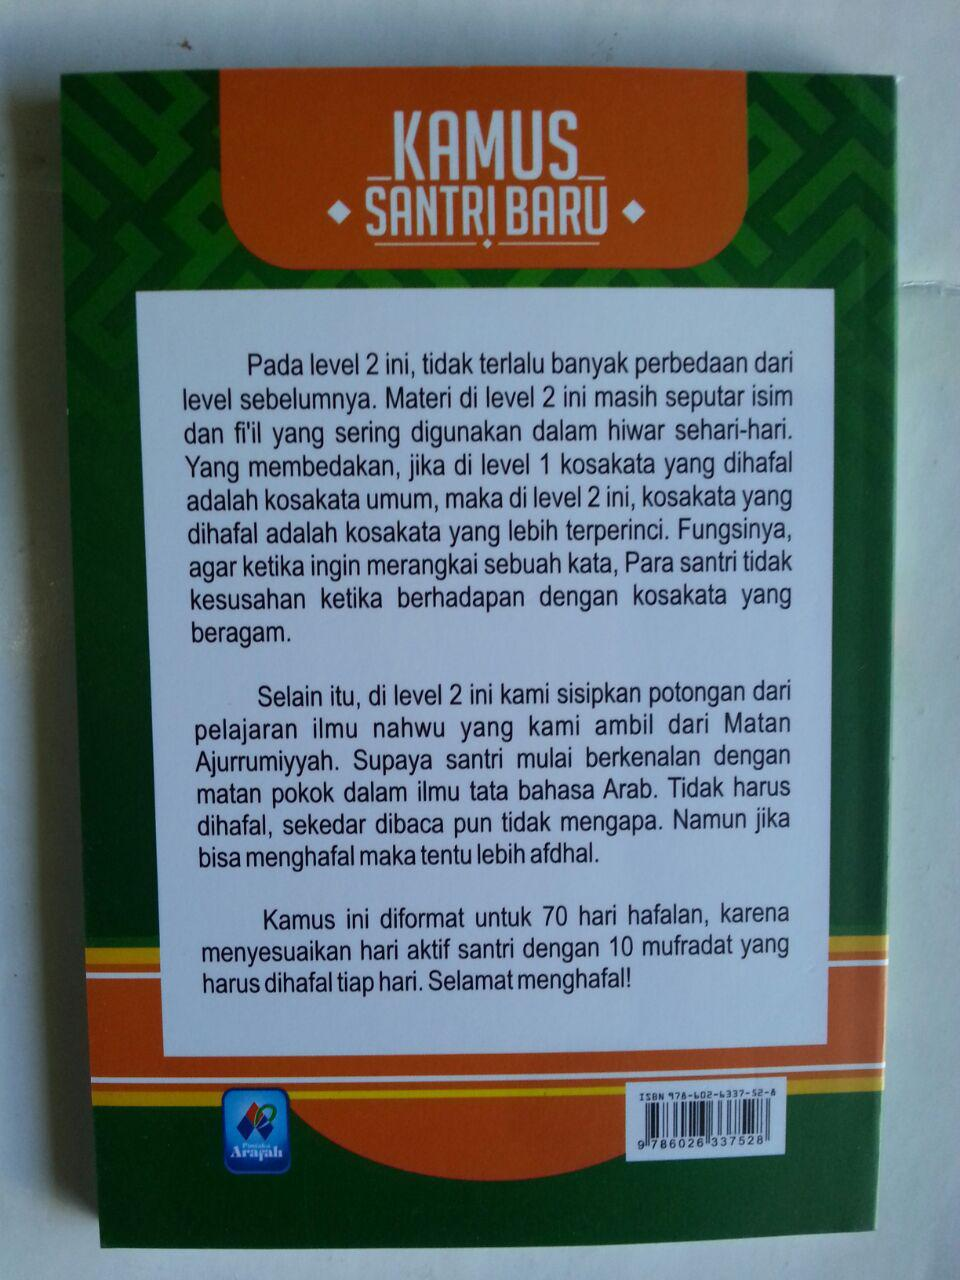 Buku Kamus Santri Baru Arab Indonesia 1 Set 3 Jilid cover 3